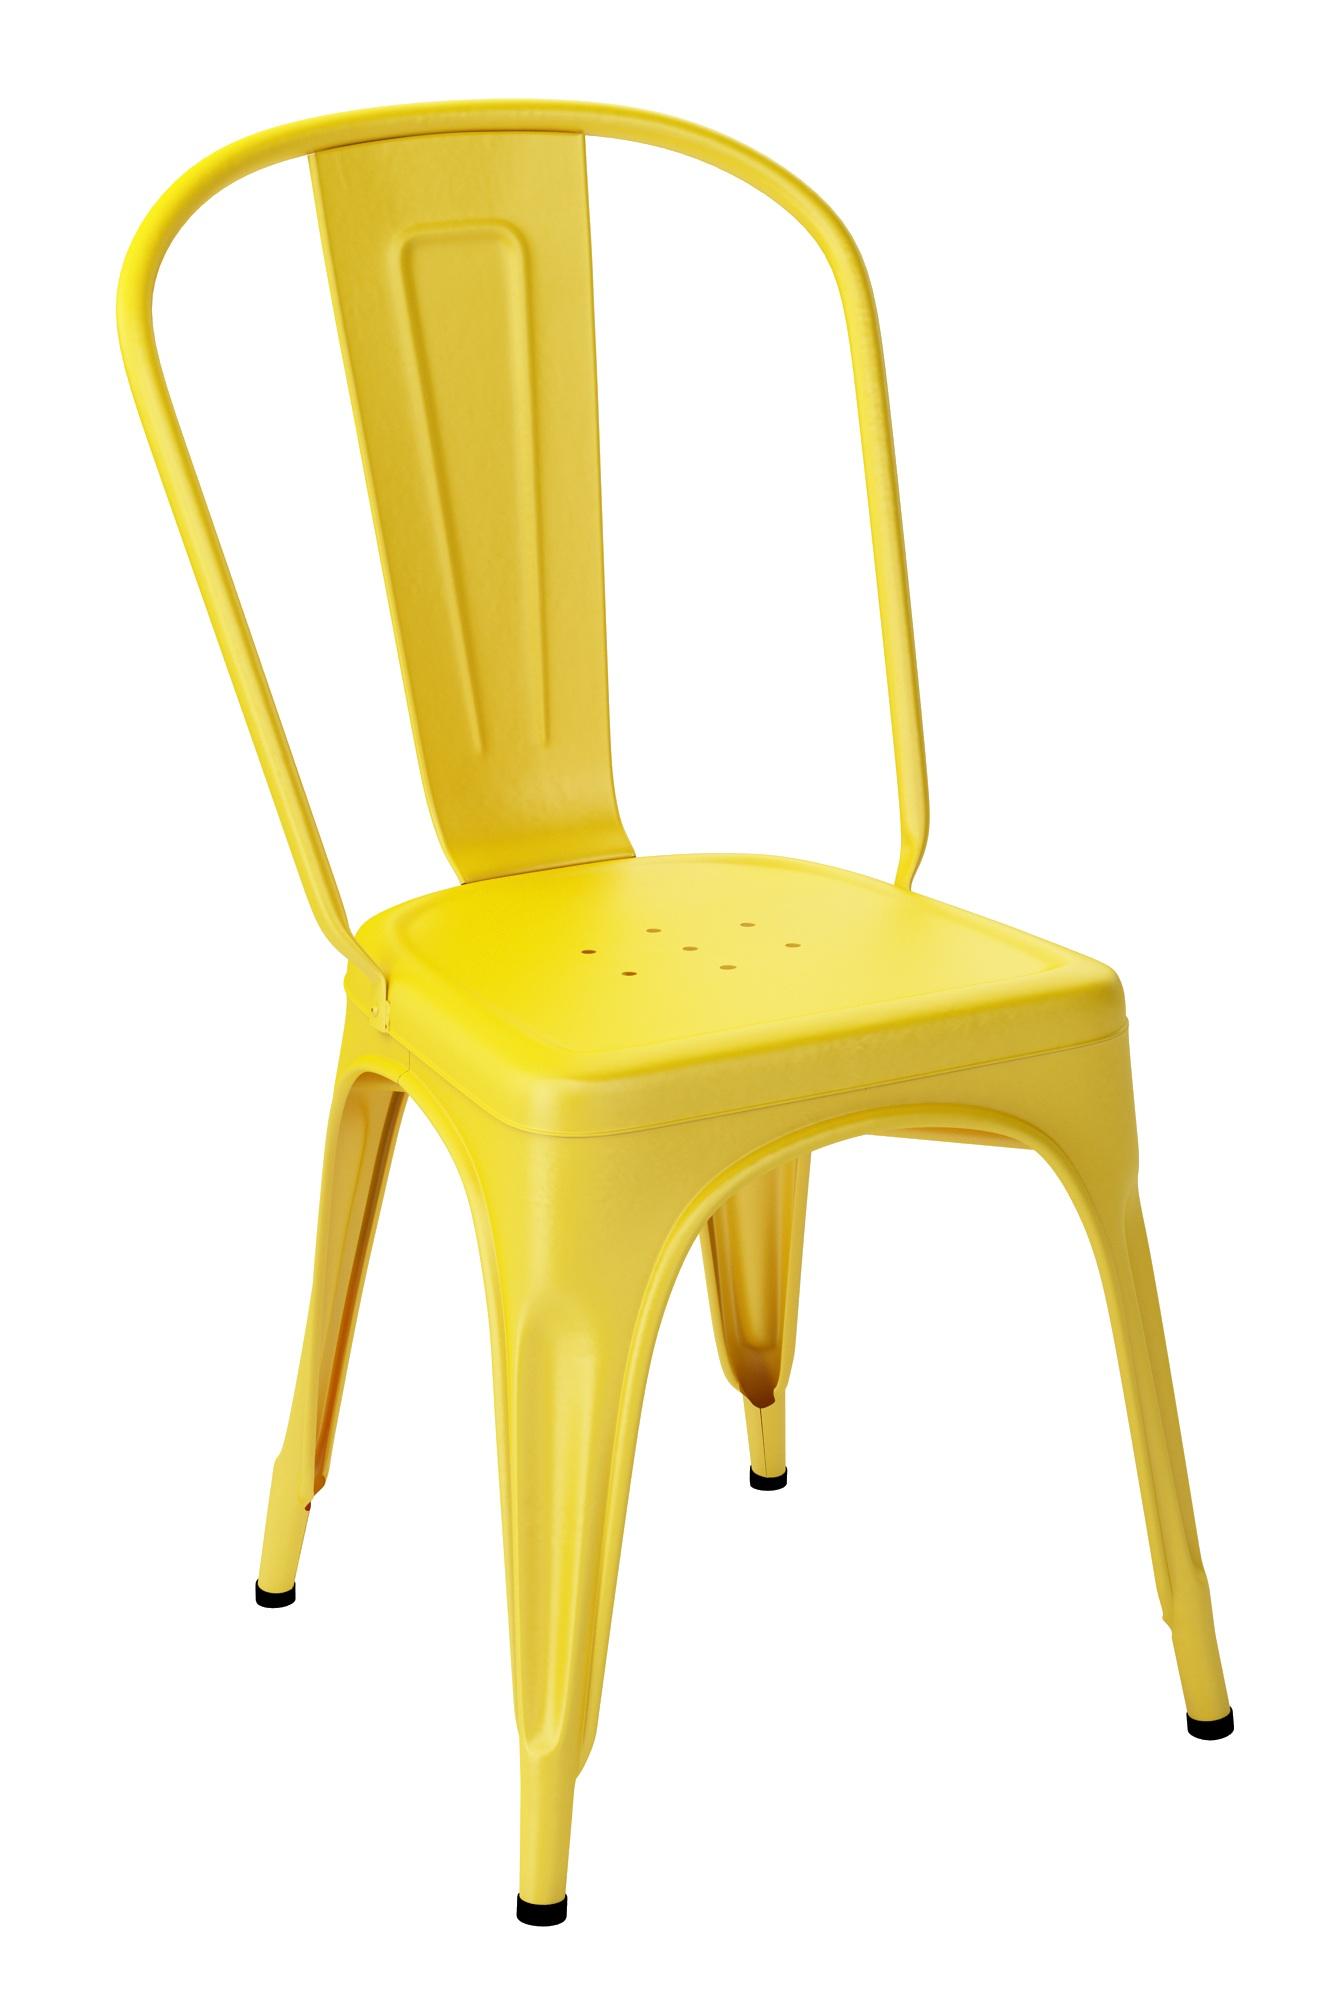 chaise tolix a jaune vif. Black Bedroom Furniture Sets. Home Design Ideas